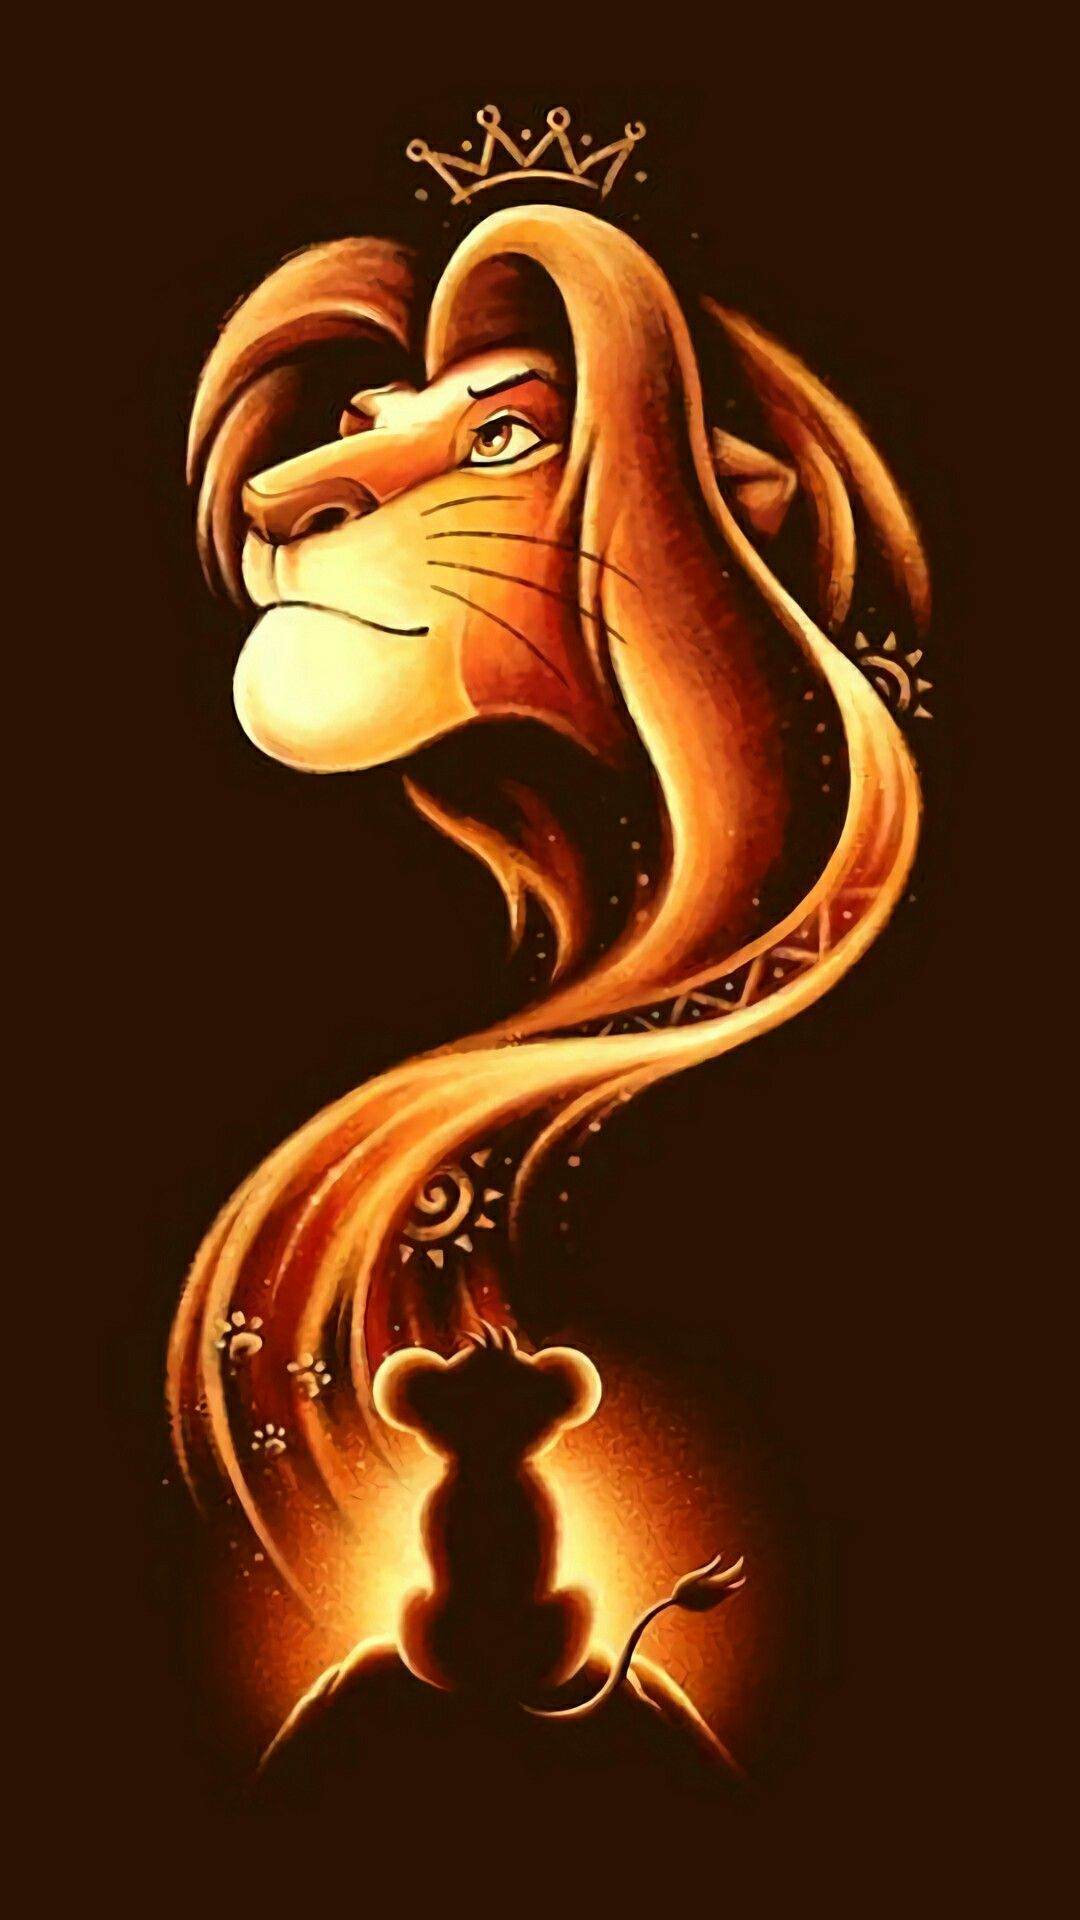 Lion King Fondos De Pantalla Sfondi Il Re Leone Y